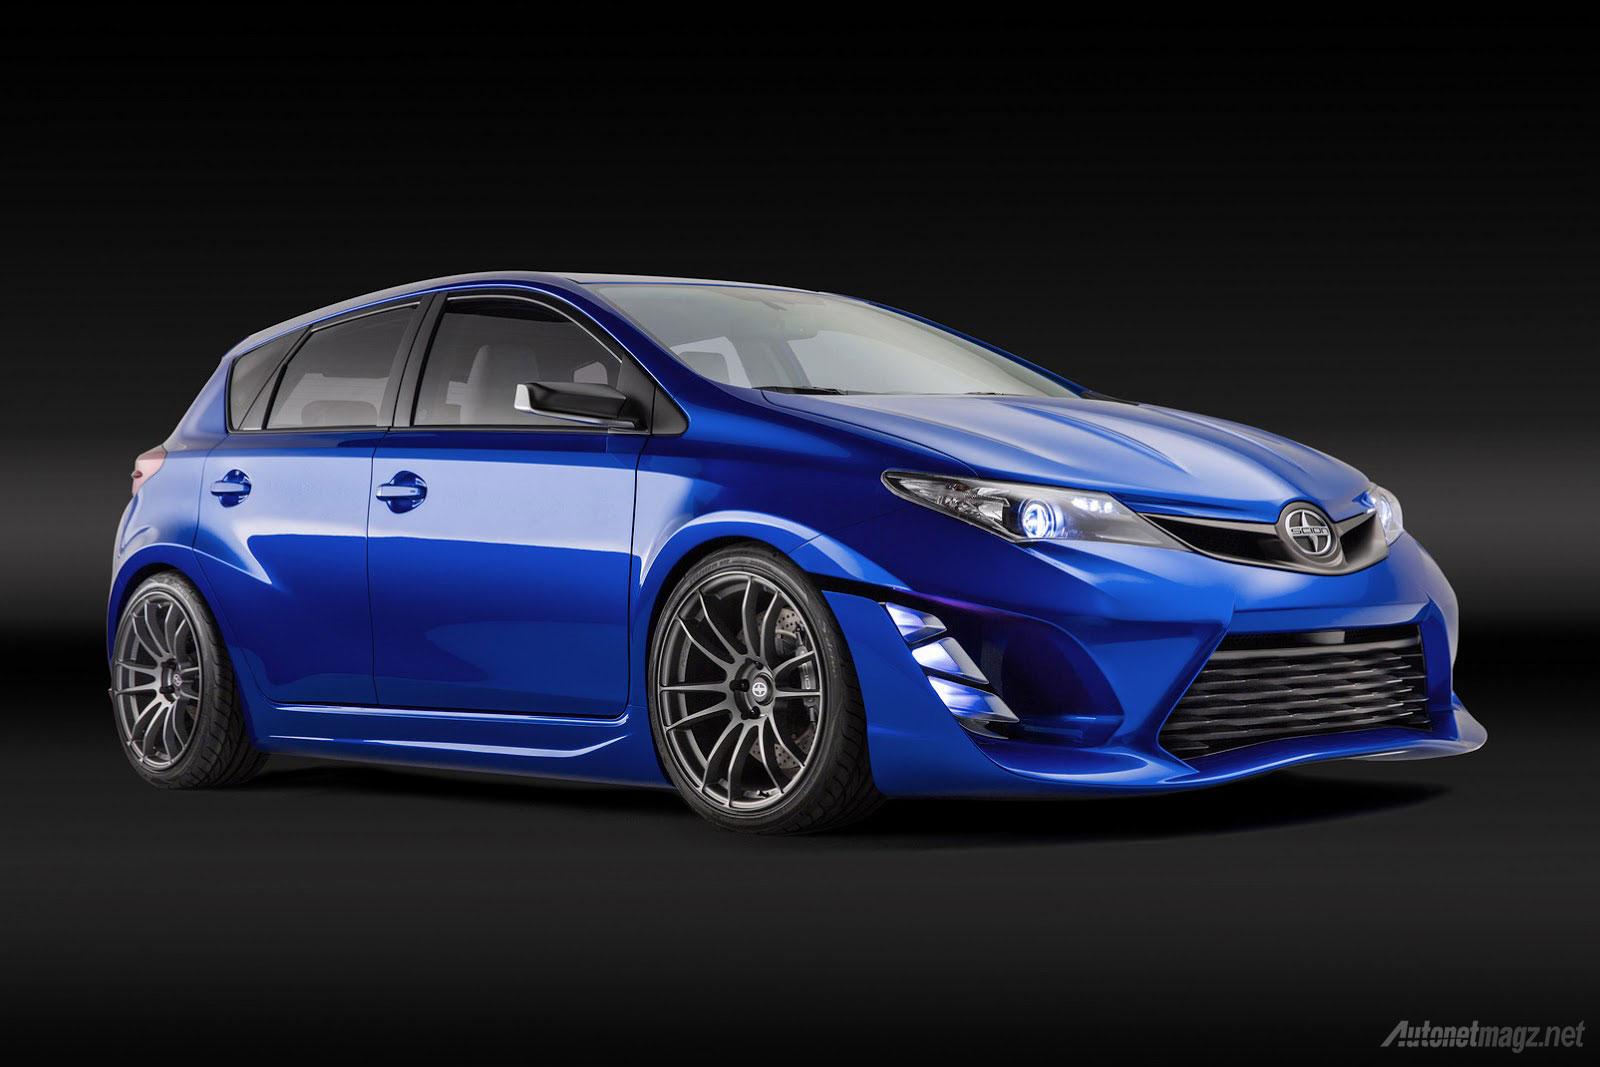 Wallpaper mobil hatchback baru Scion iM Concept 2015 yang satu platform dengan Toyota Auris